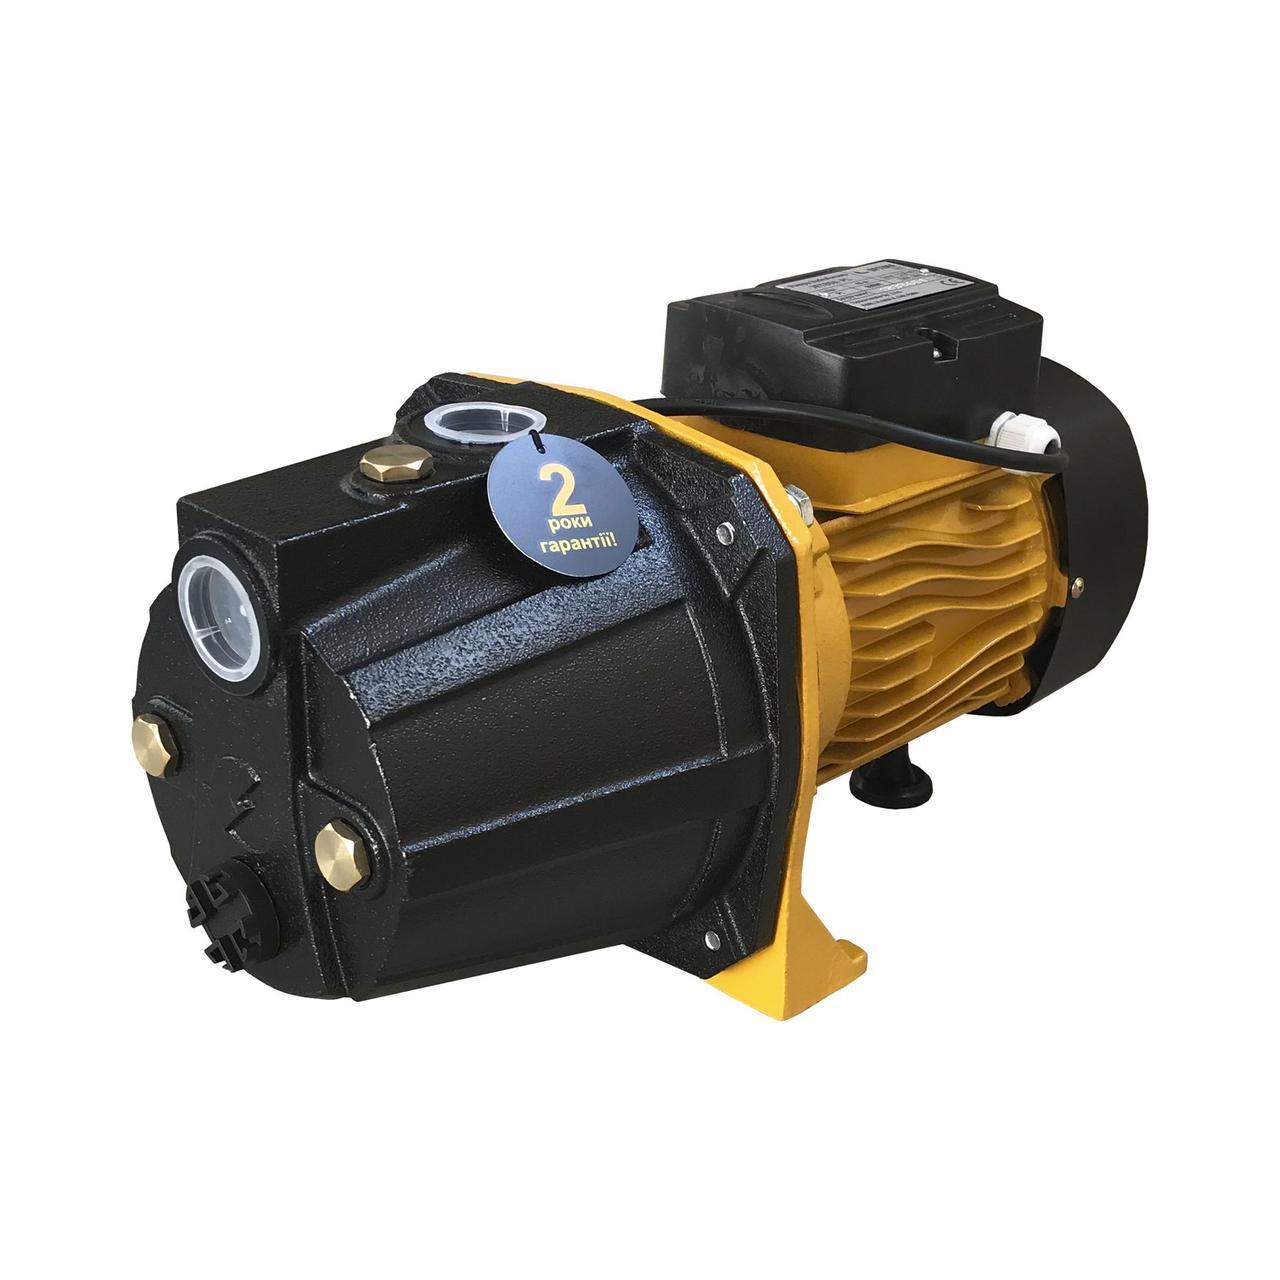 Насос центробежный Optima JET80A-PL 0,8 кВт чугун короткий